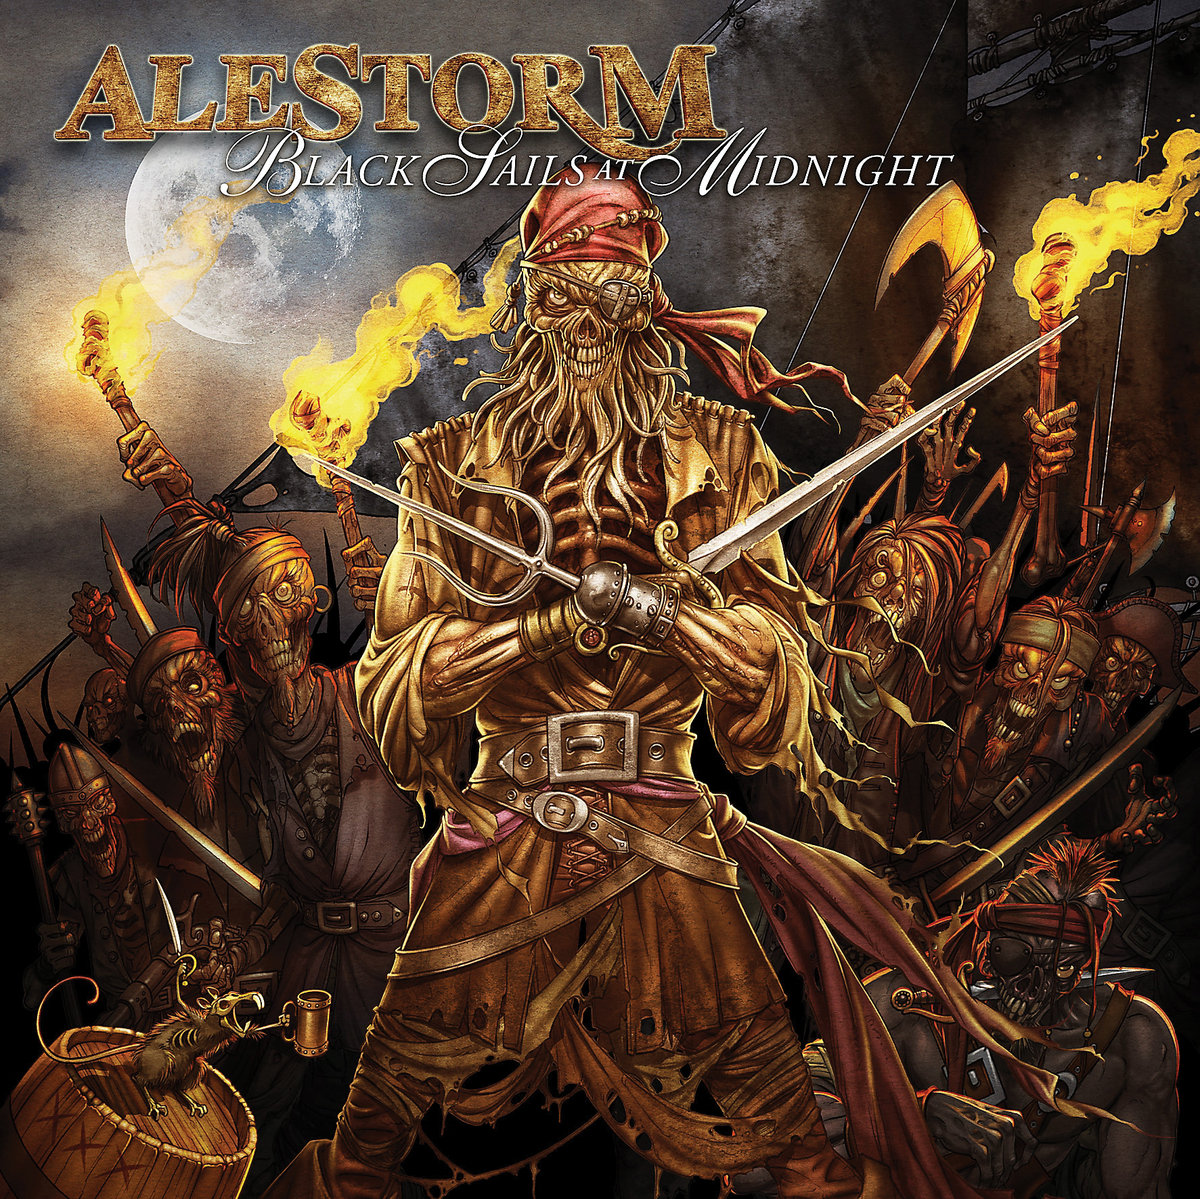 alestorm black sails at midnight album